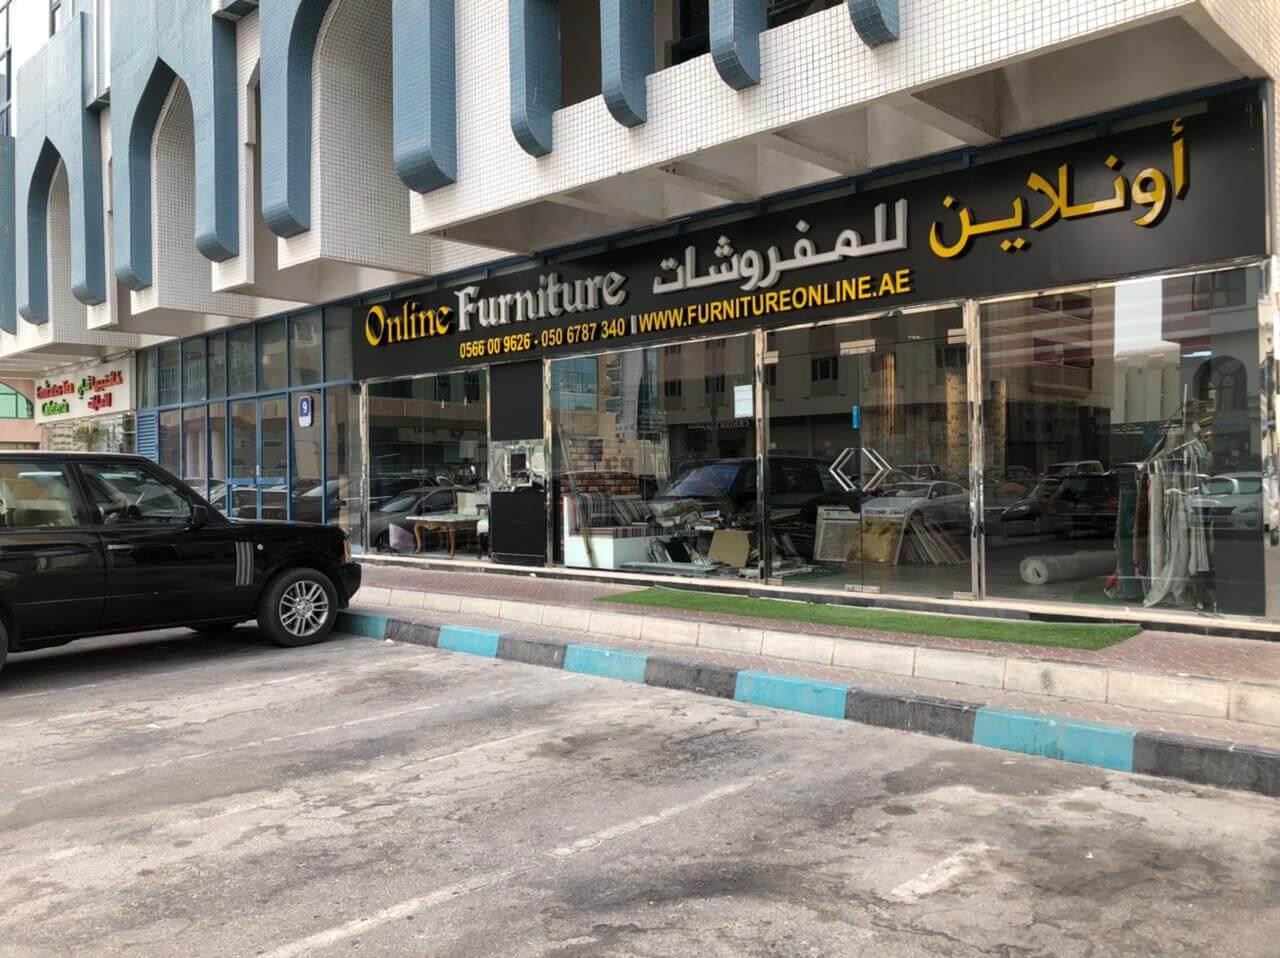 online furniture store in abu dhabi